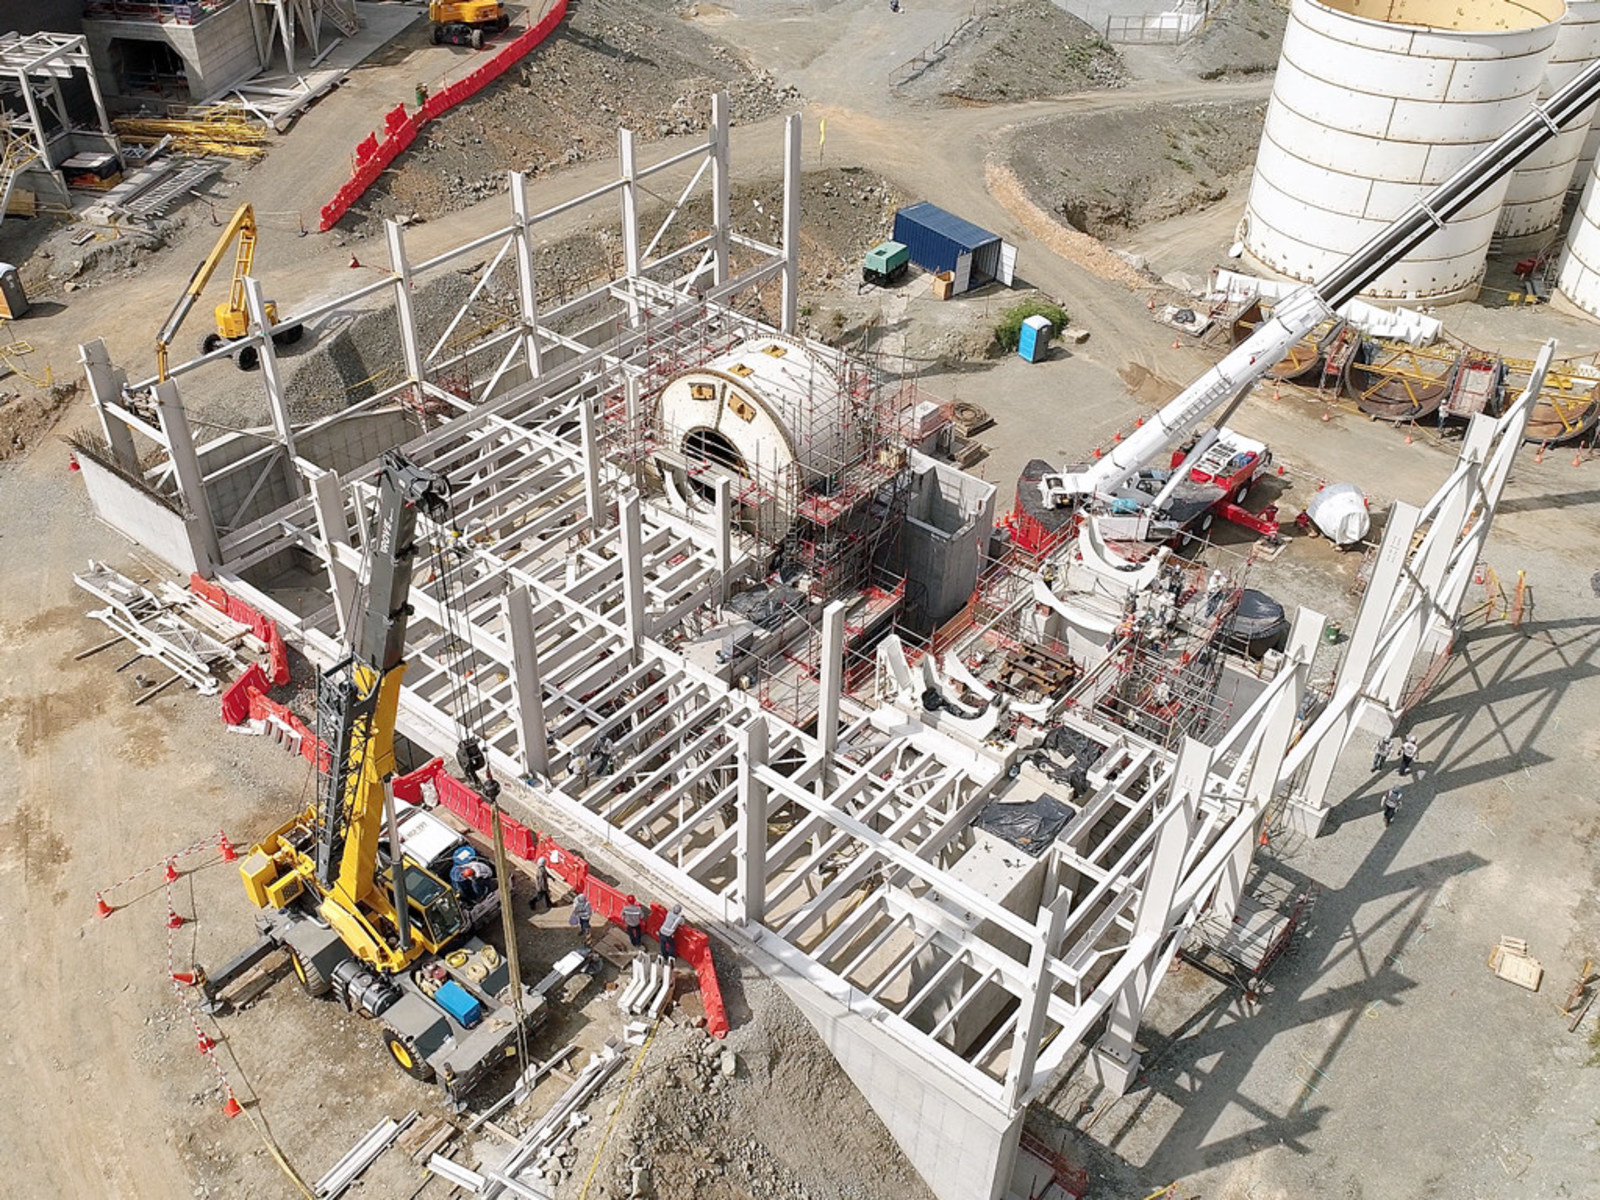 Image 2: Grinding Area Construction Underway